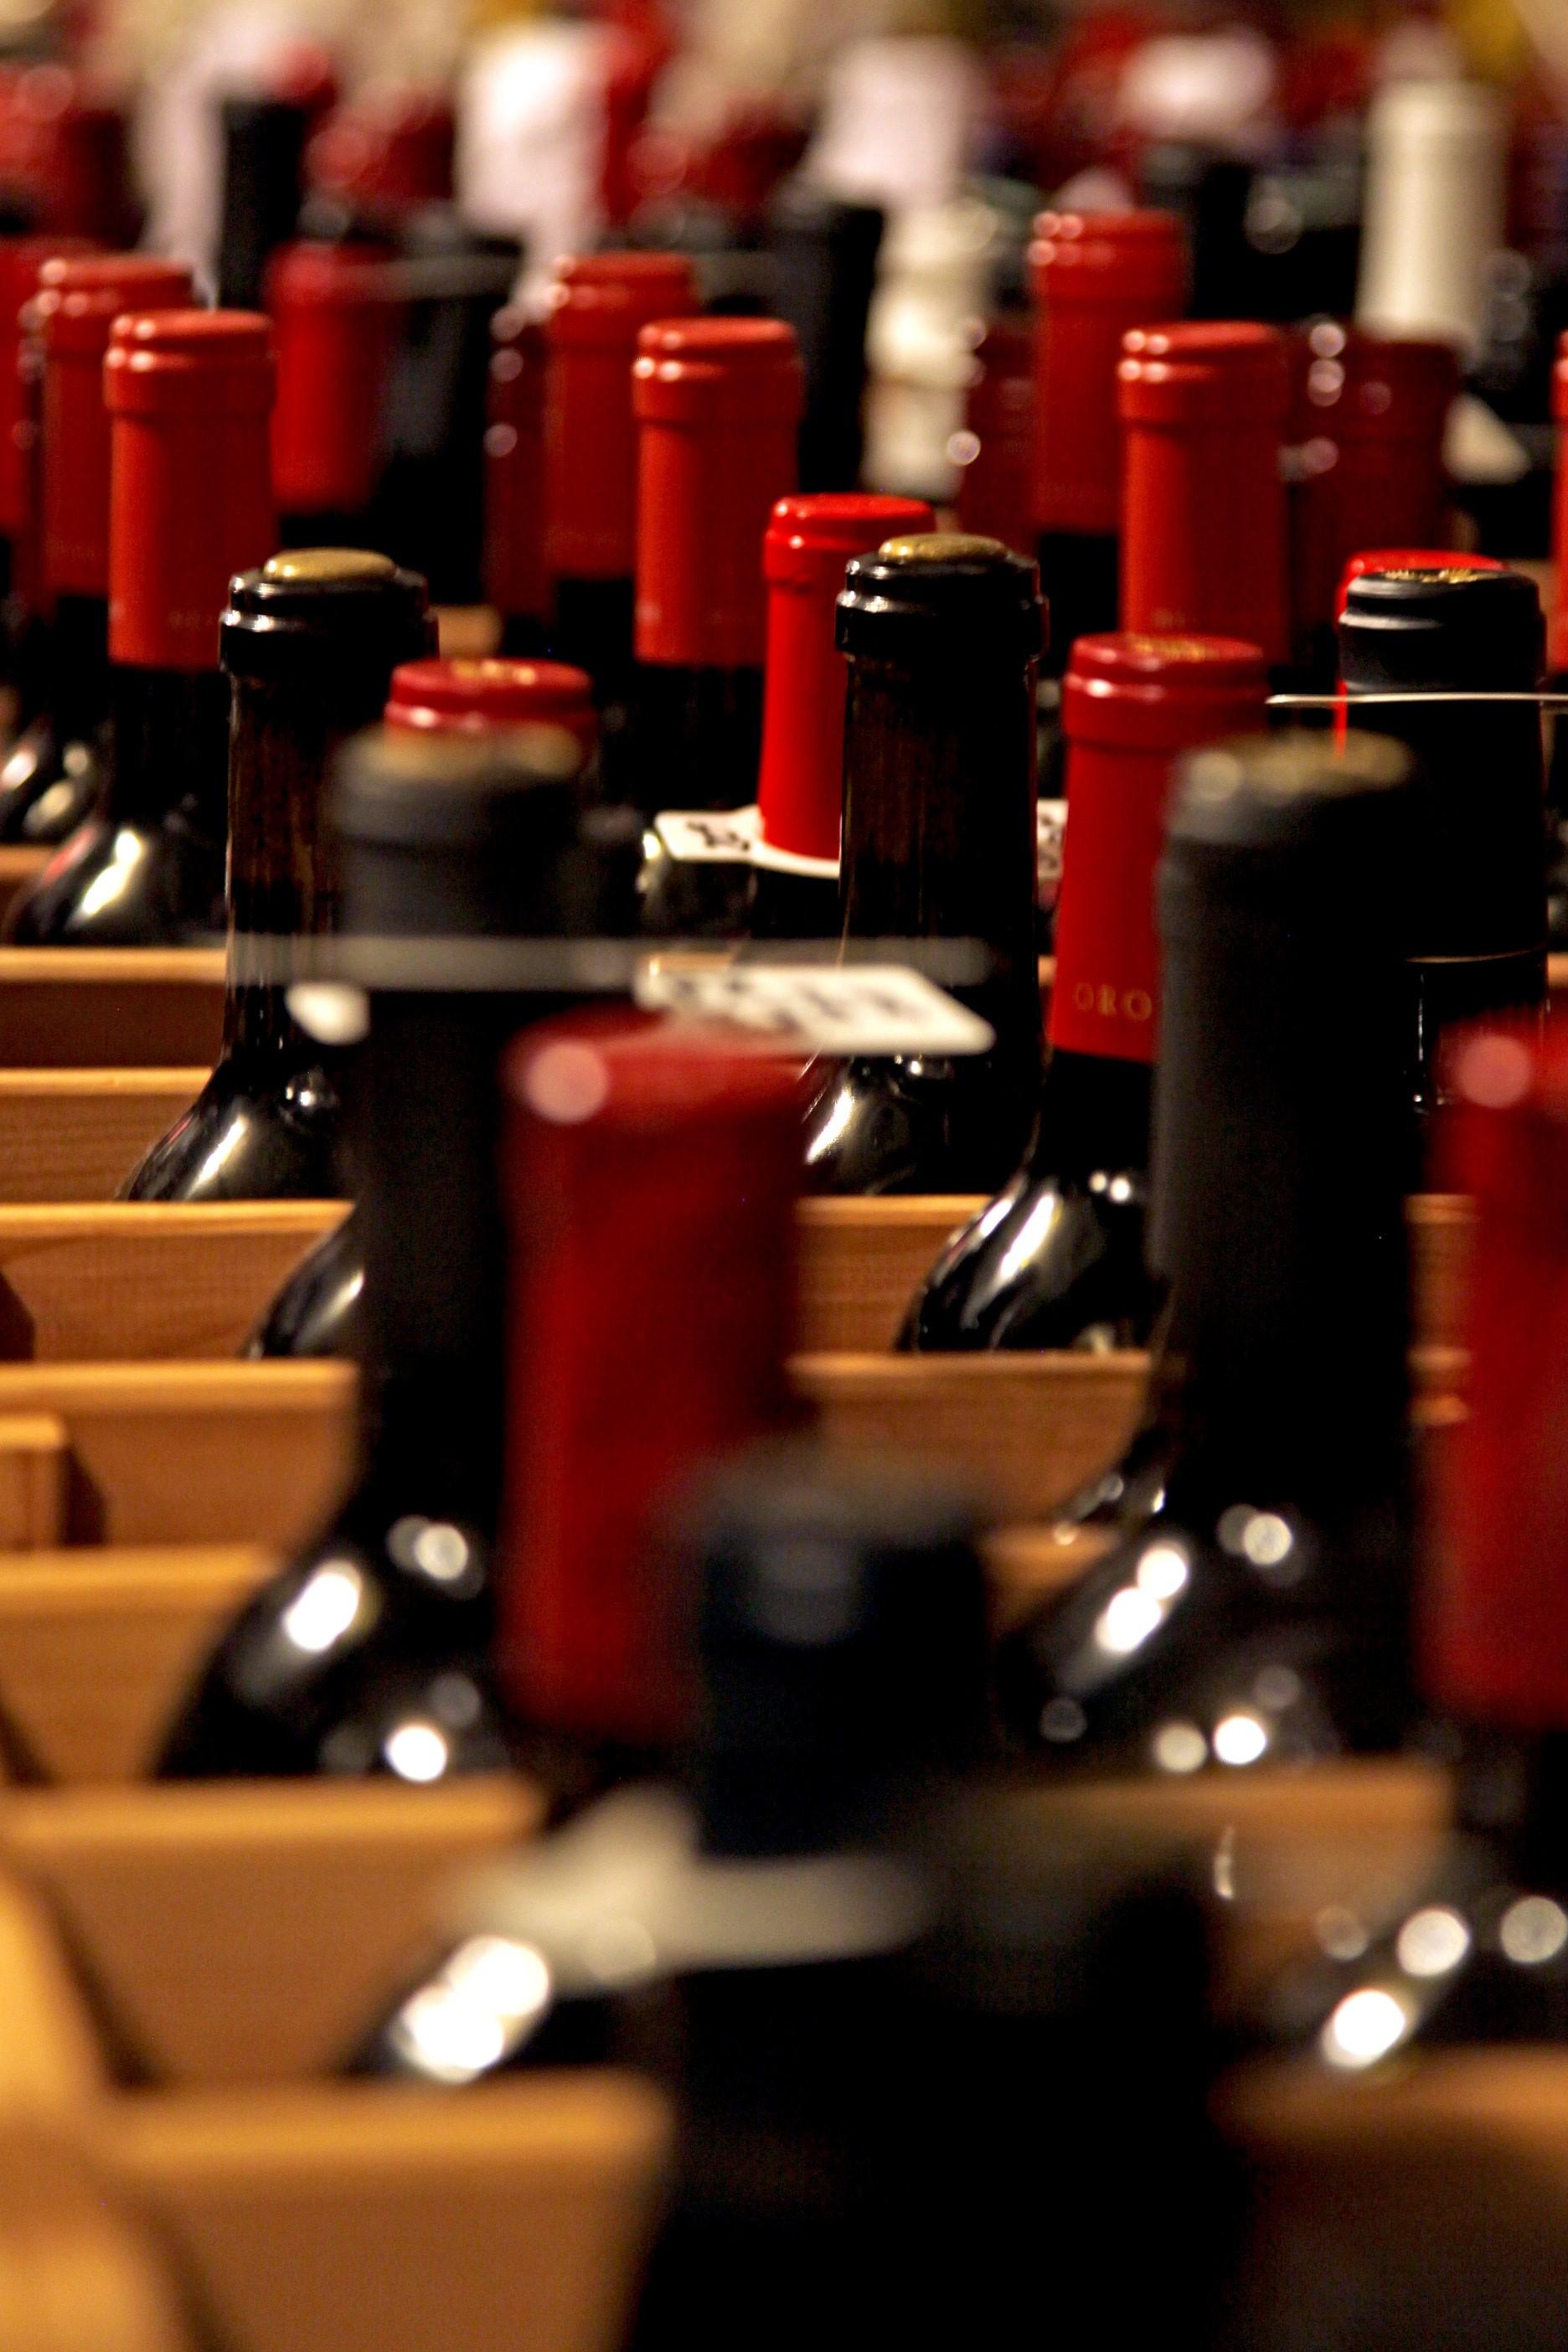 spirit-and-wine-wholesaler-national-distributor-1